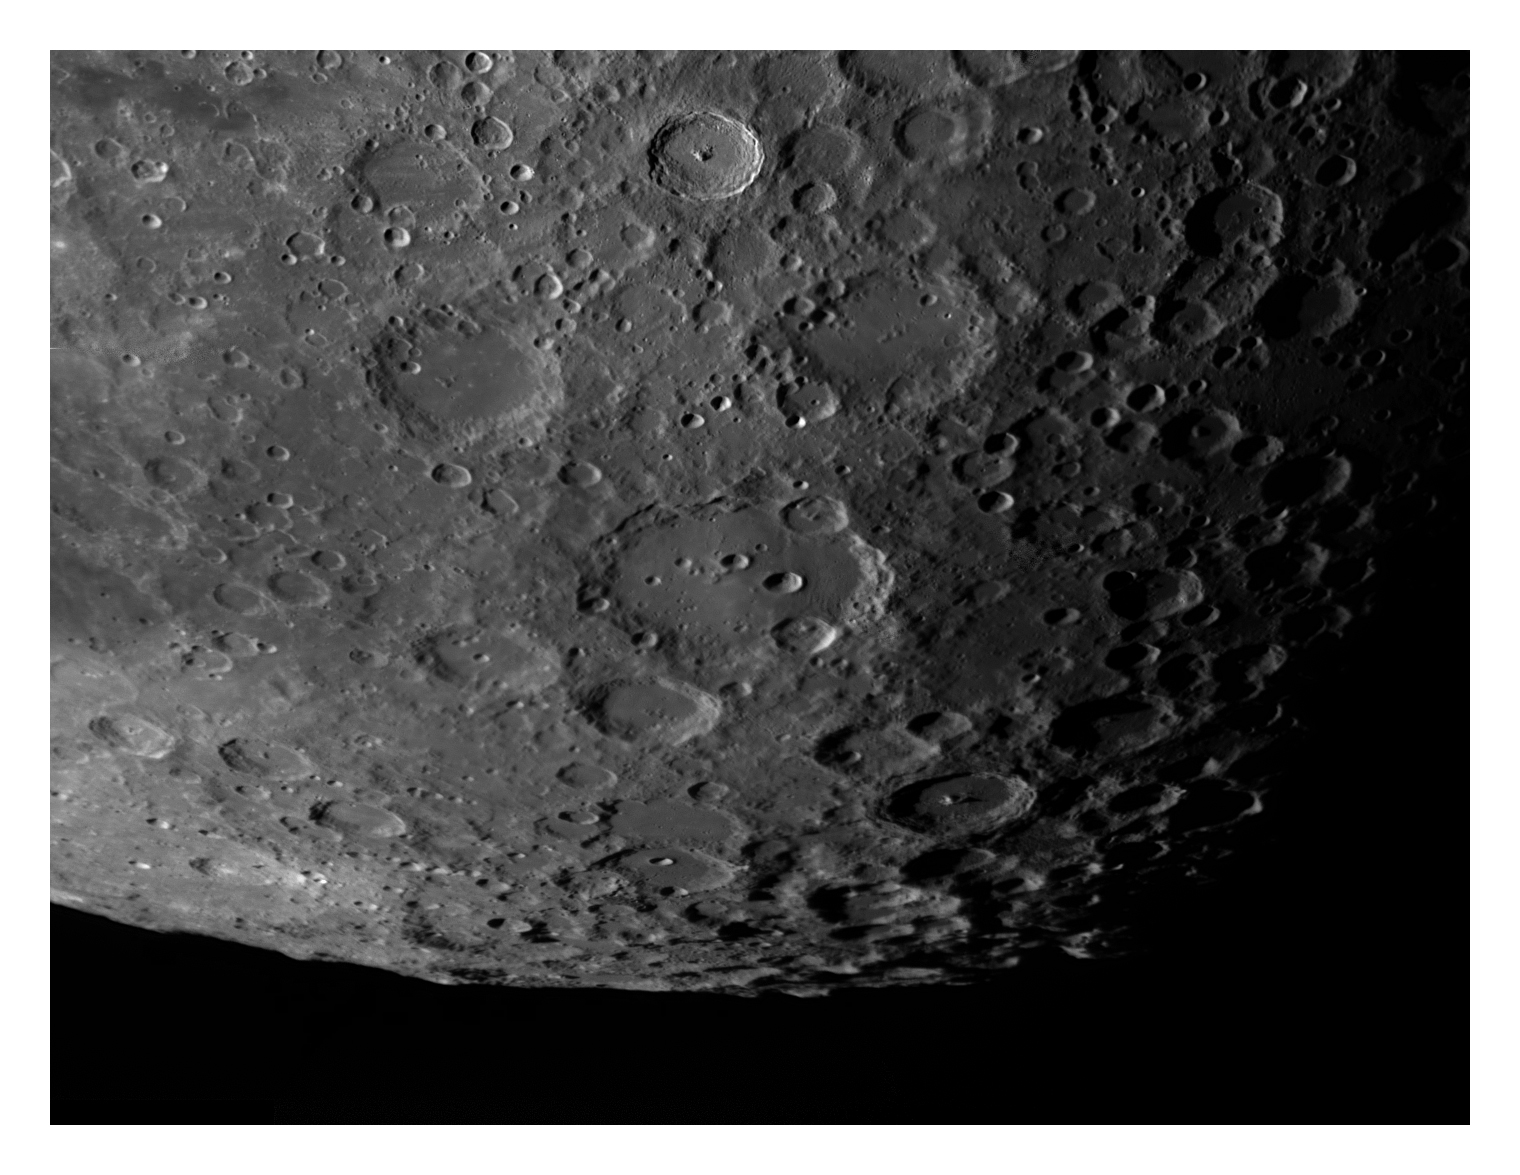 South Lunar Pole 14-06-2009 by Chrissyo